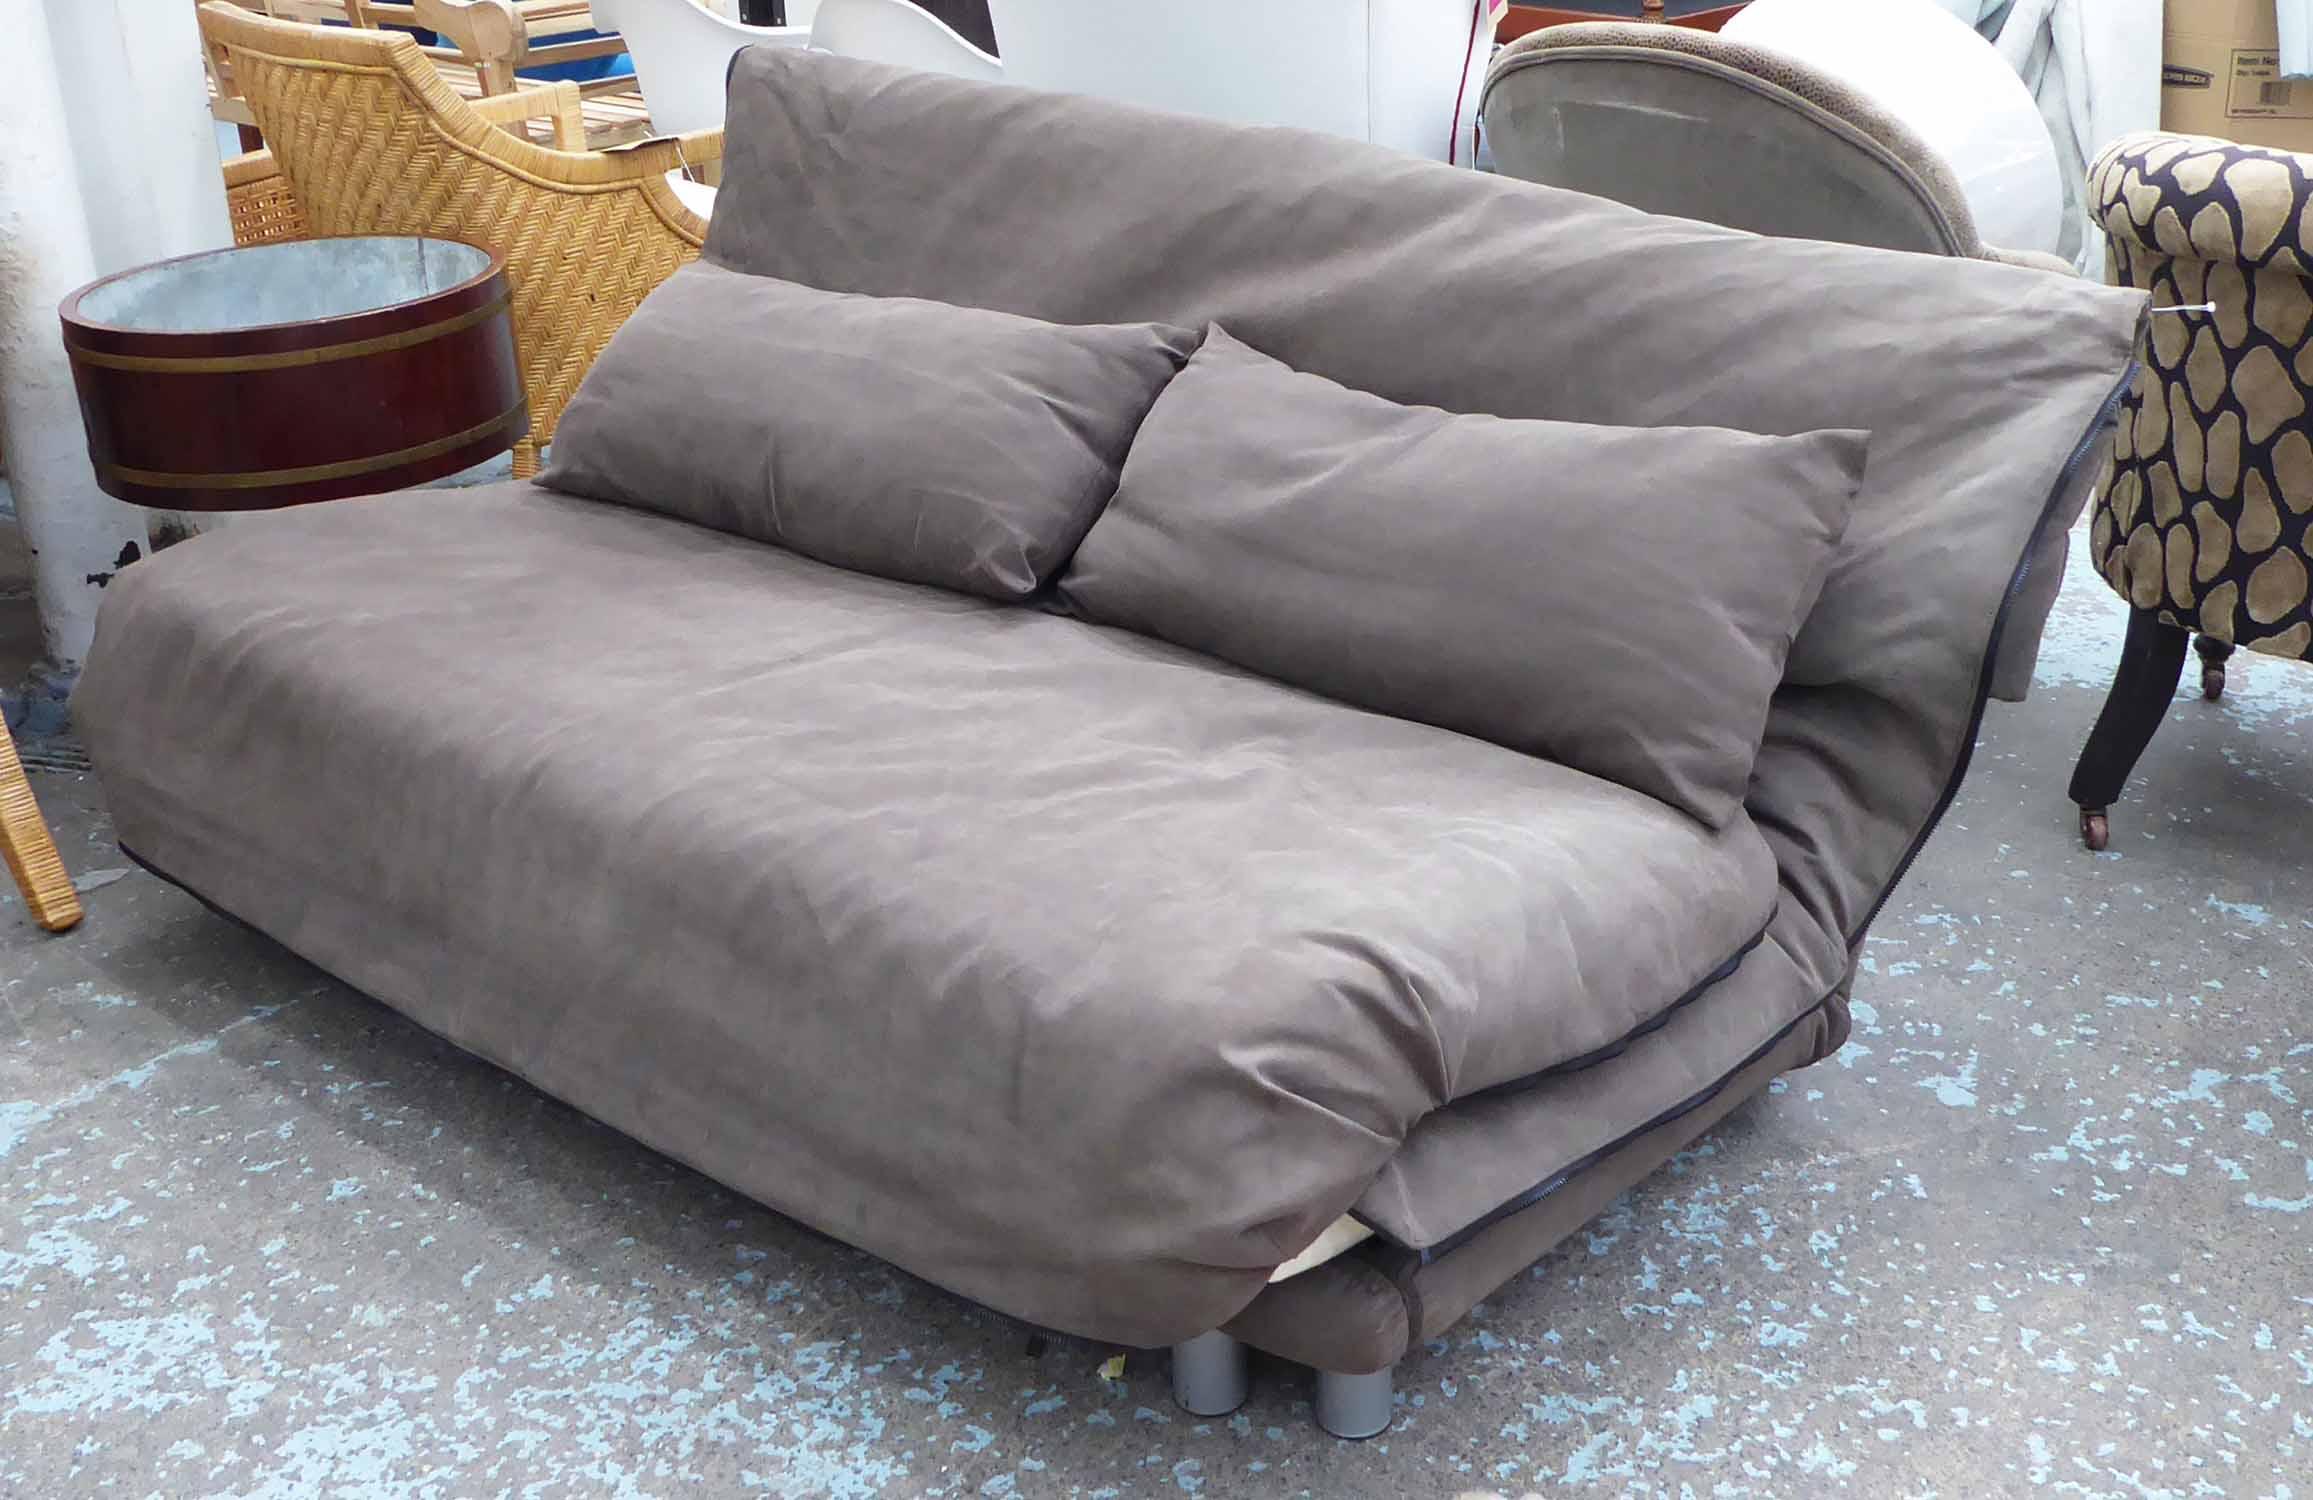 LIGNE ROSET MULTY SOFA BED, by Claude Brisson, 165cm W